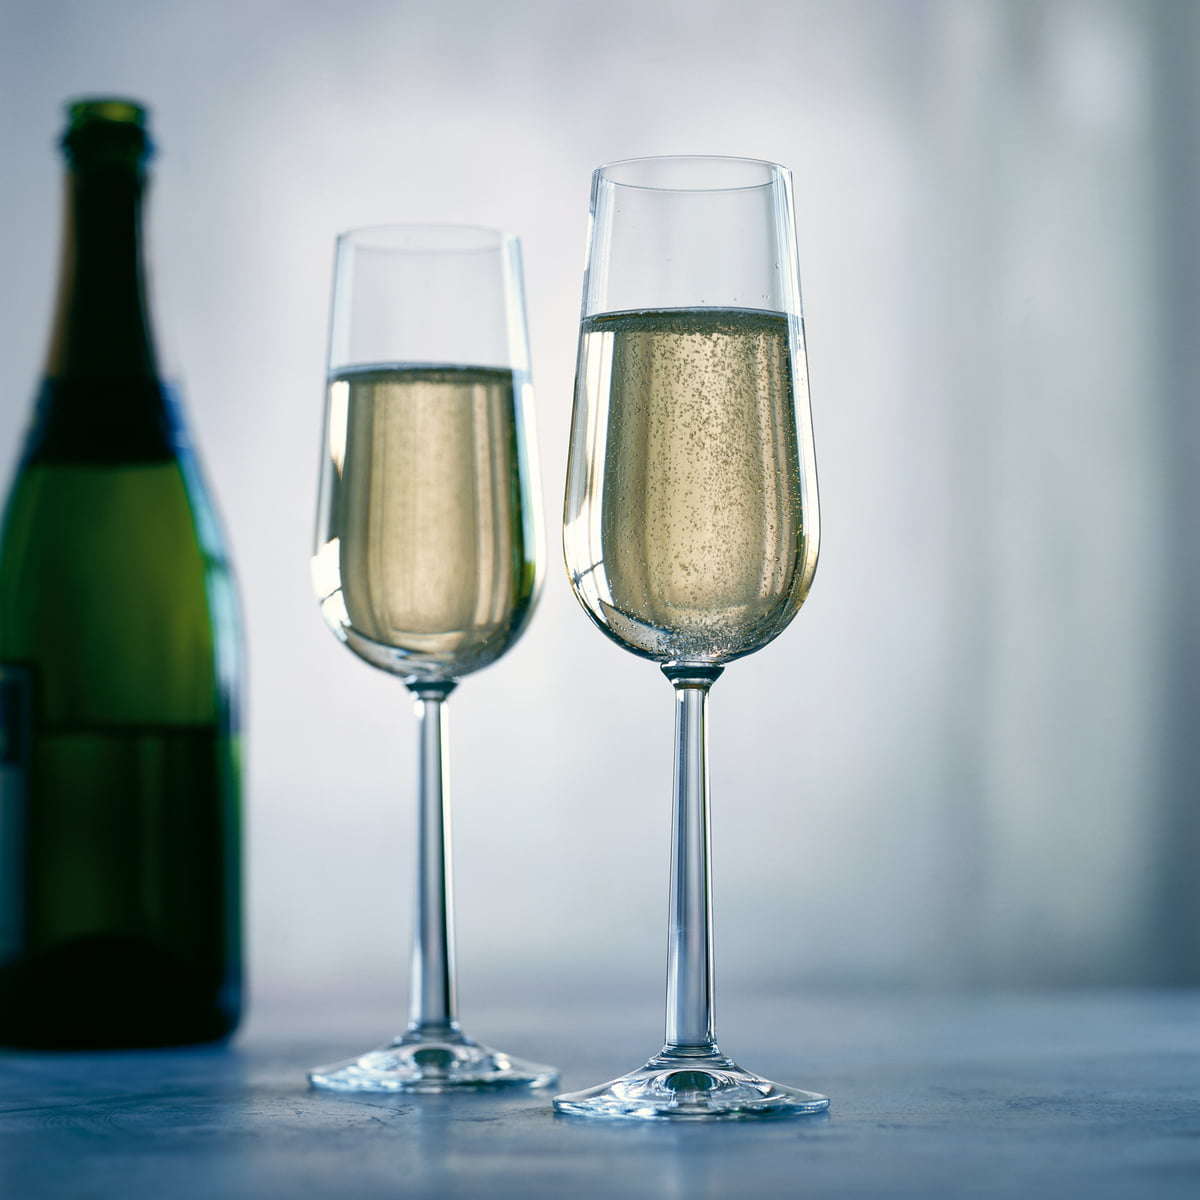 grand cru champagne glass by rosendahl. Black Bedroom Furniture Sets. Home Design Ideas